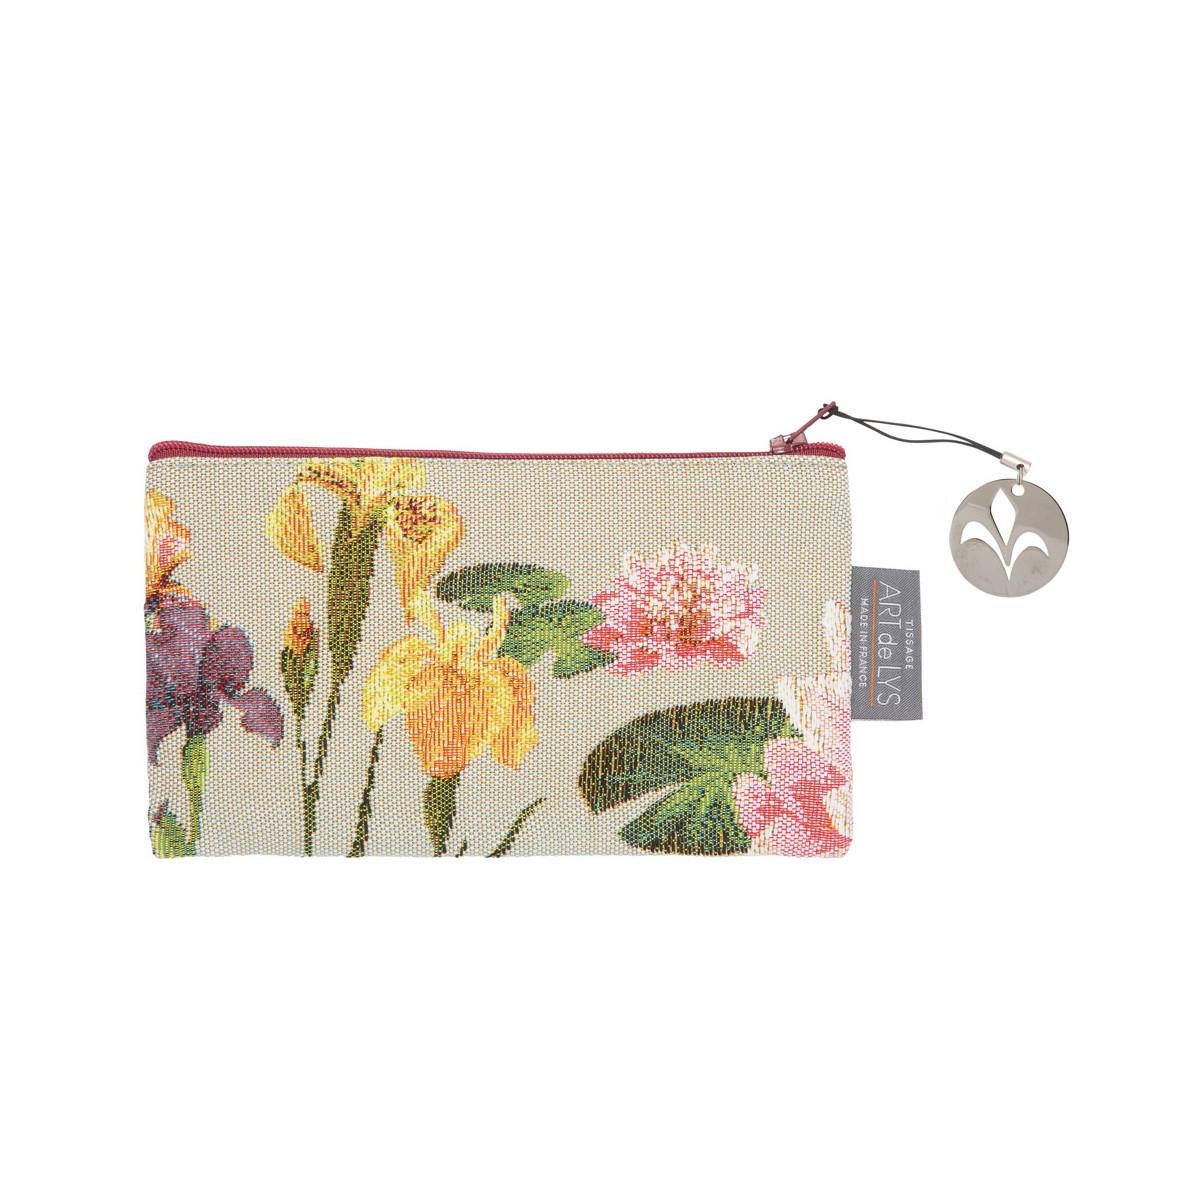 Pochette tapisserie giverny multi fleurs gris 11x17